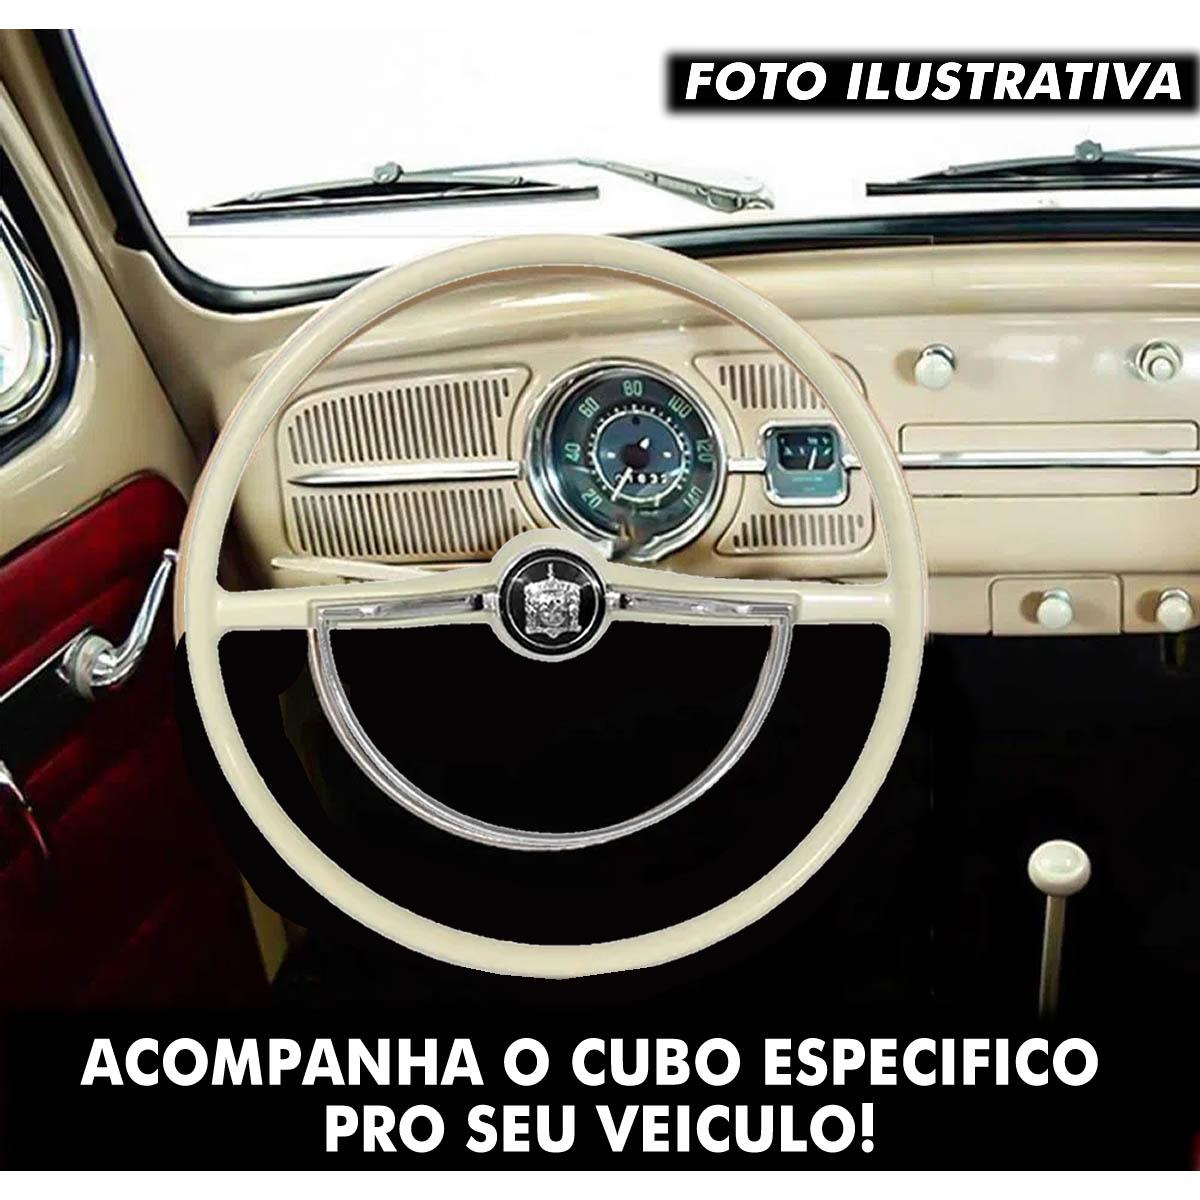 Volante Original Volkswagen Cálice Cubo Fusca 1959 a 1996 Brasilia 1973 a 1982 Poliparts